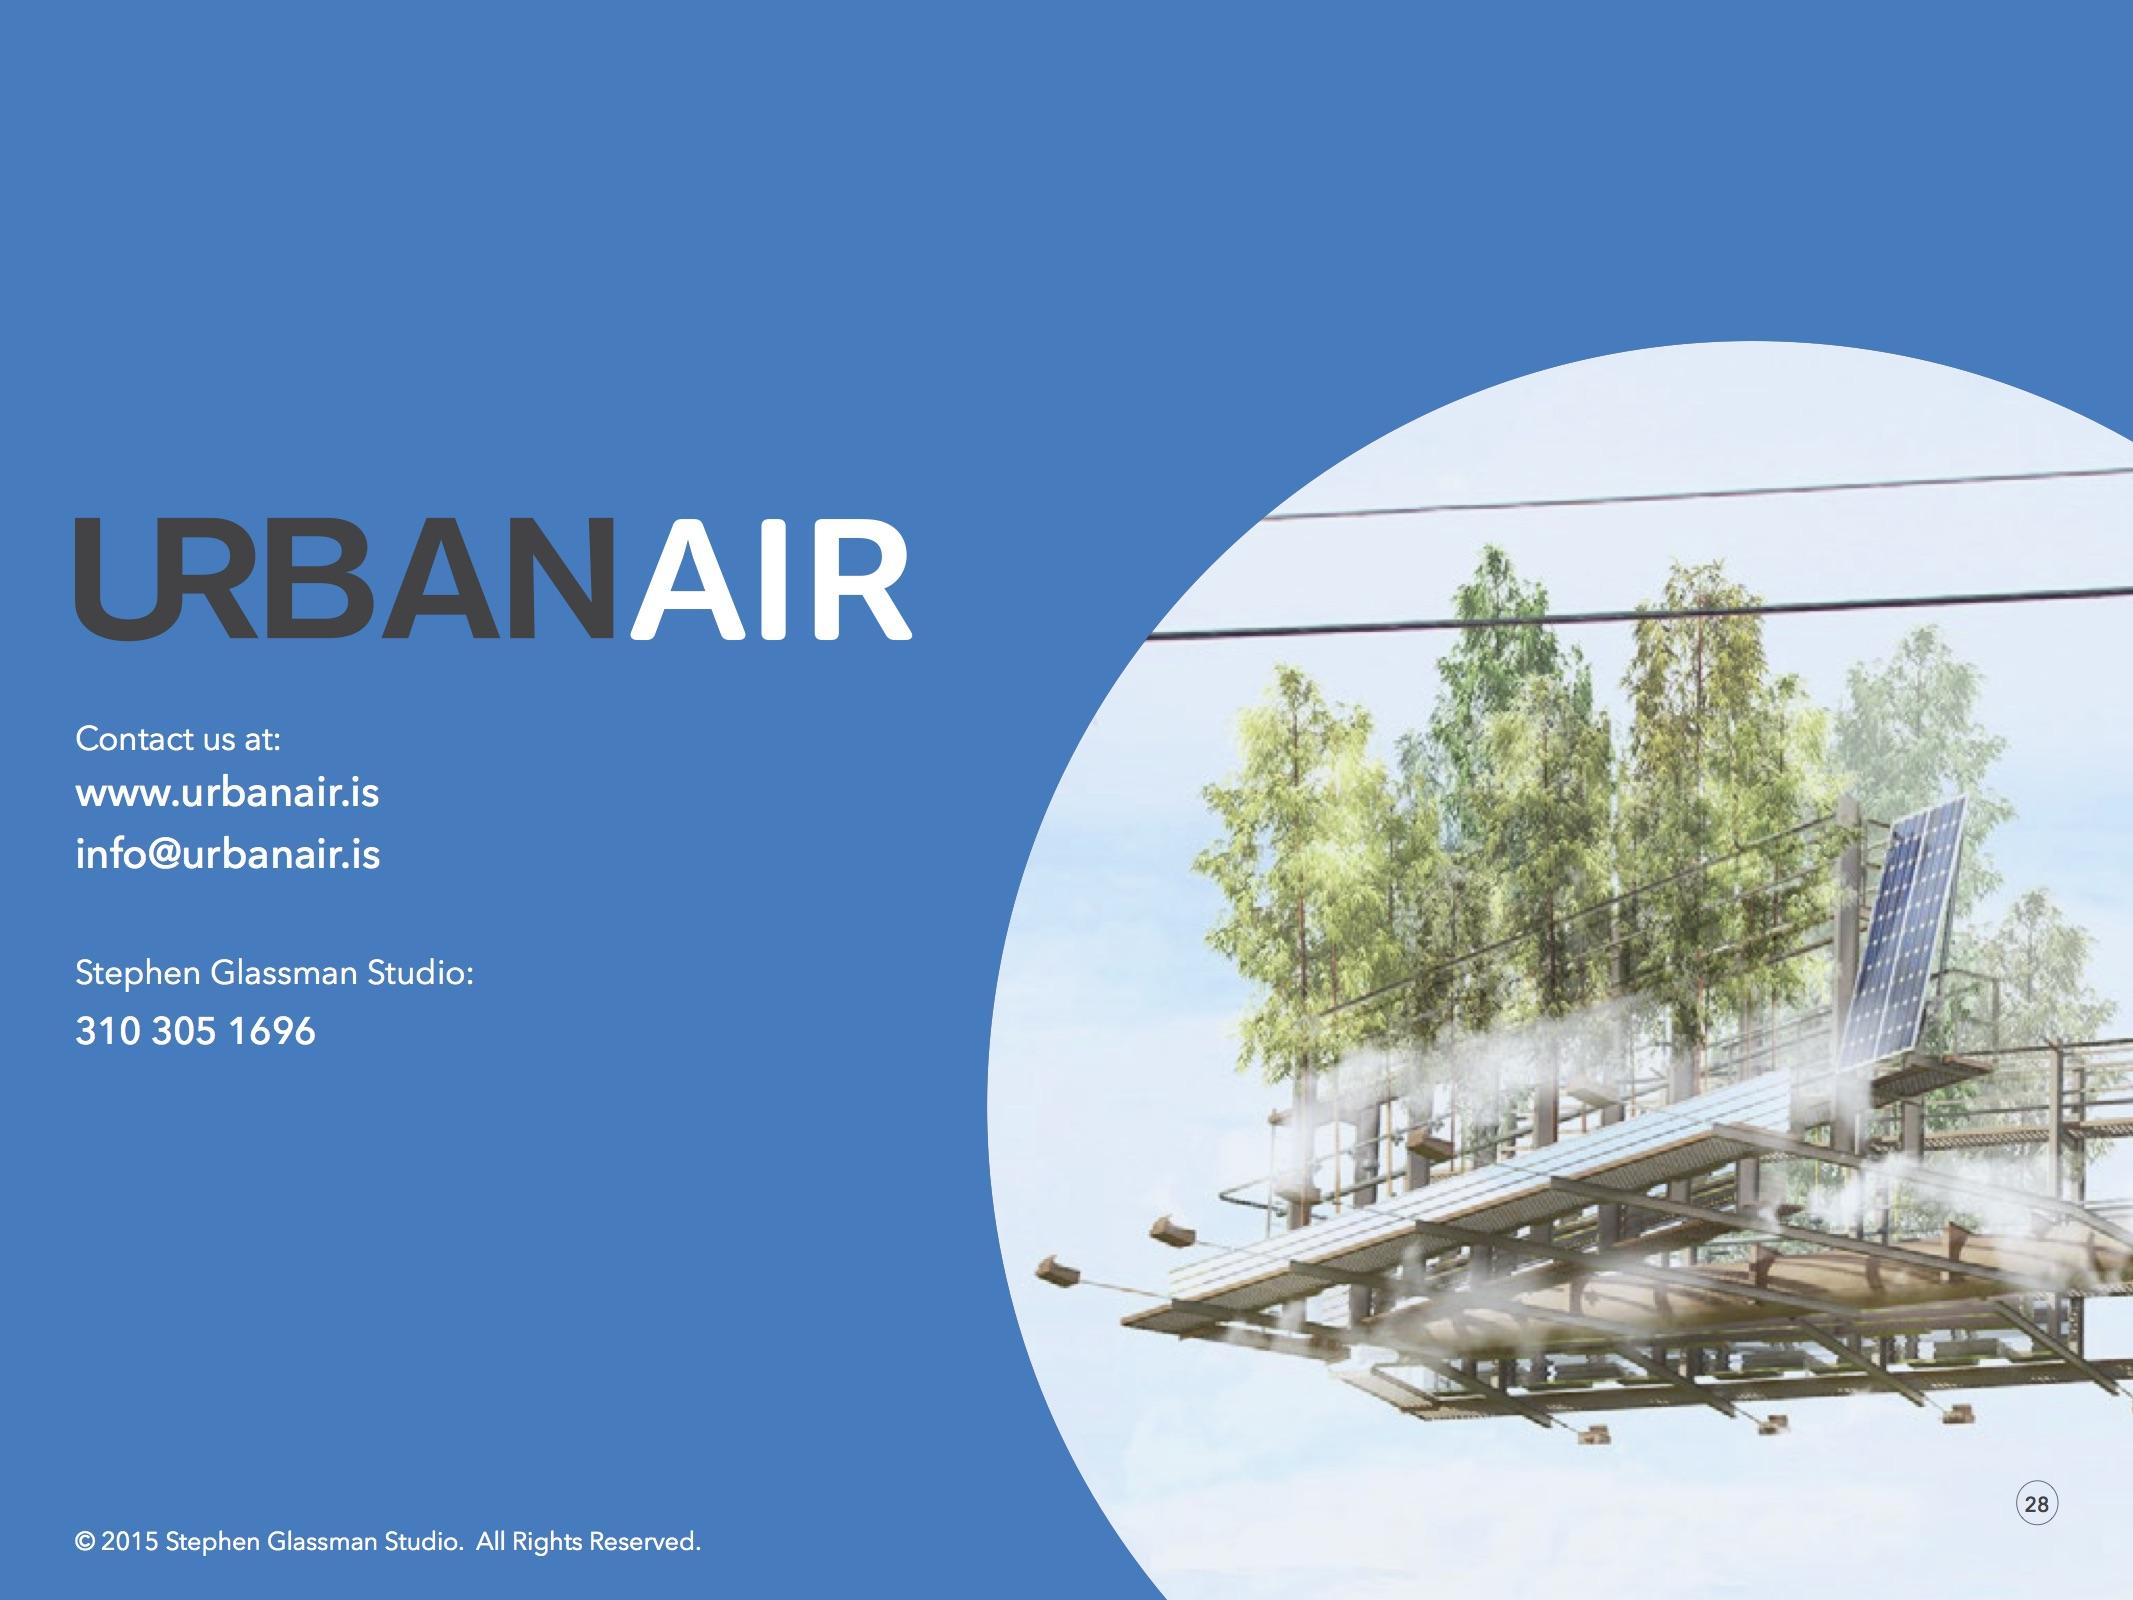 01.13.15_UrbanAir City Pitch_FIN28.jpg